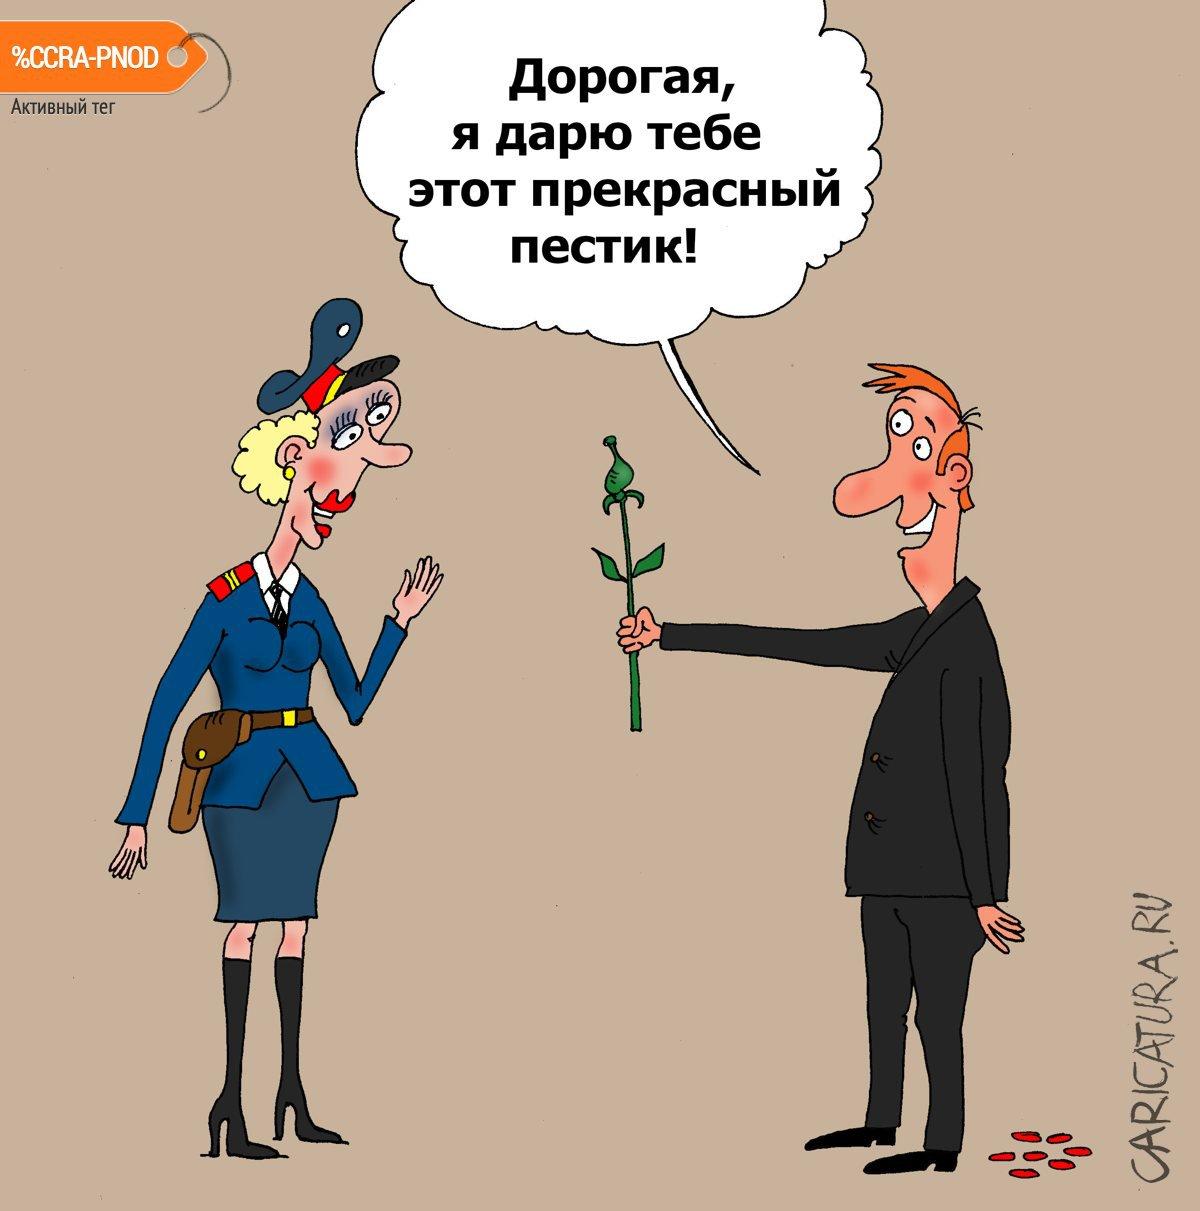 Пестик, Валерий Тарасенко